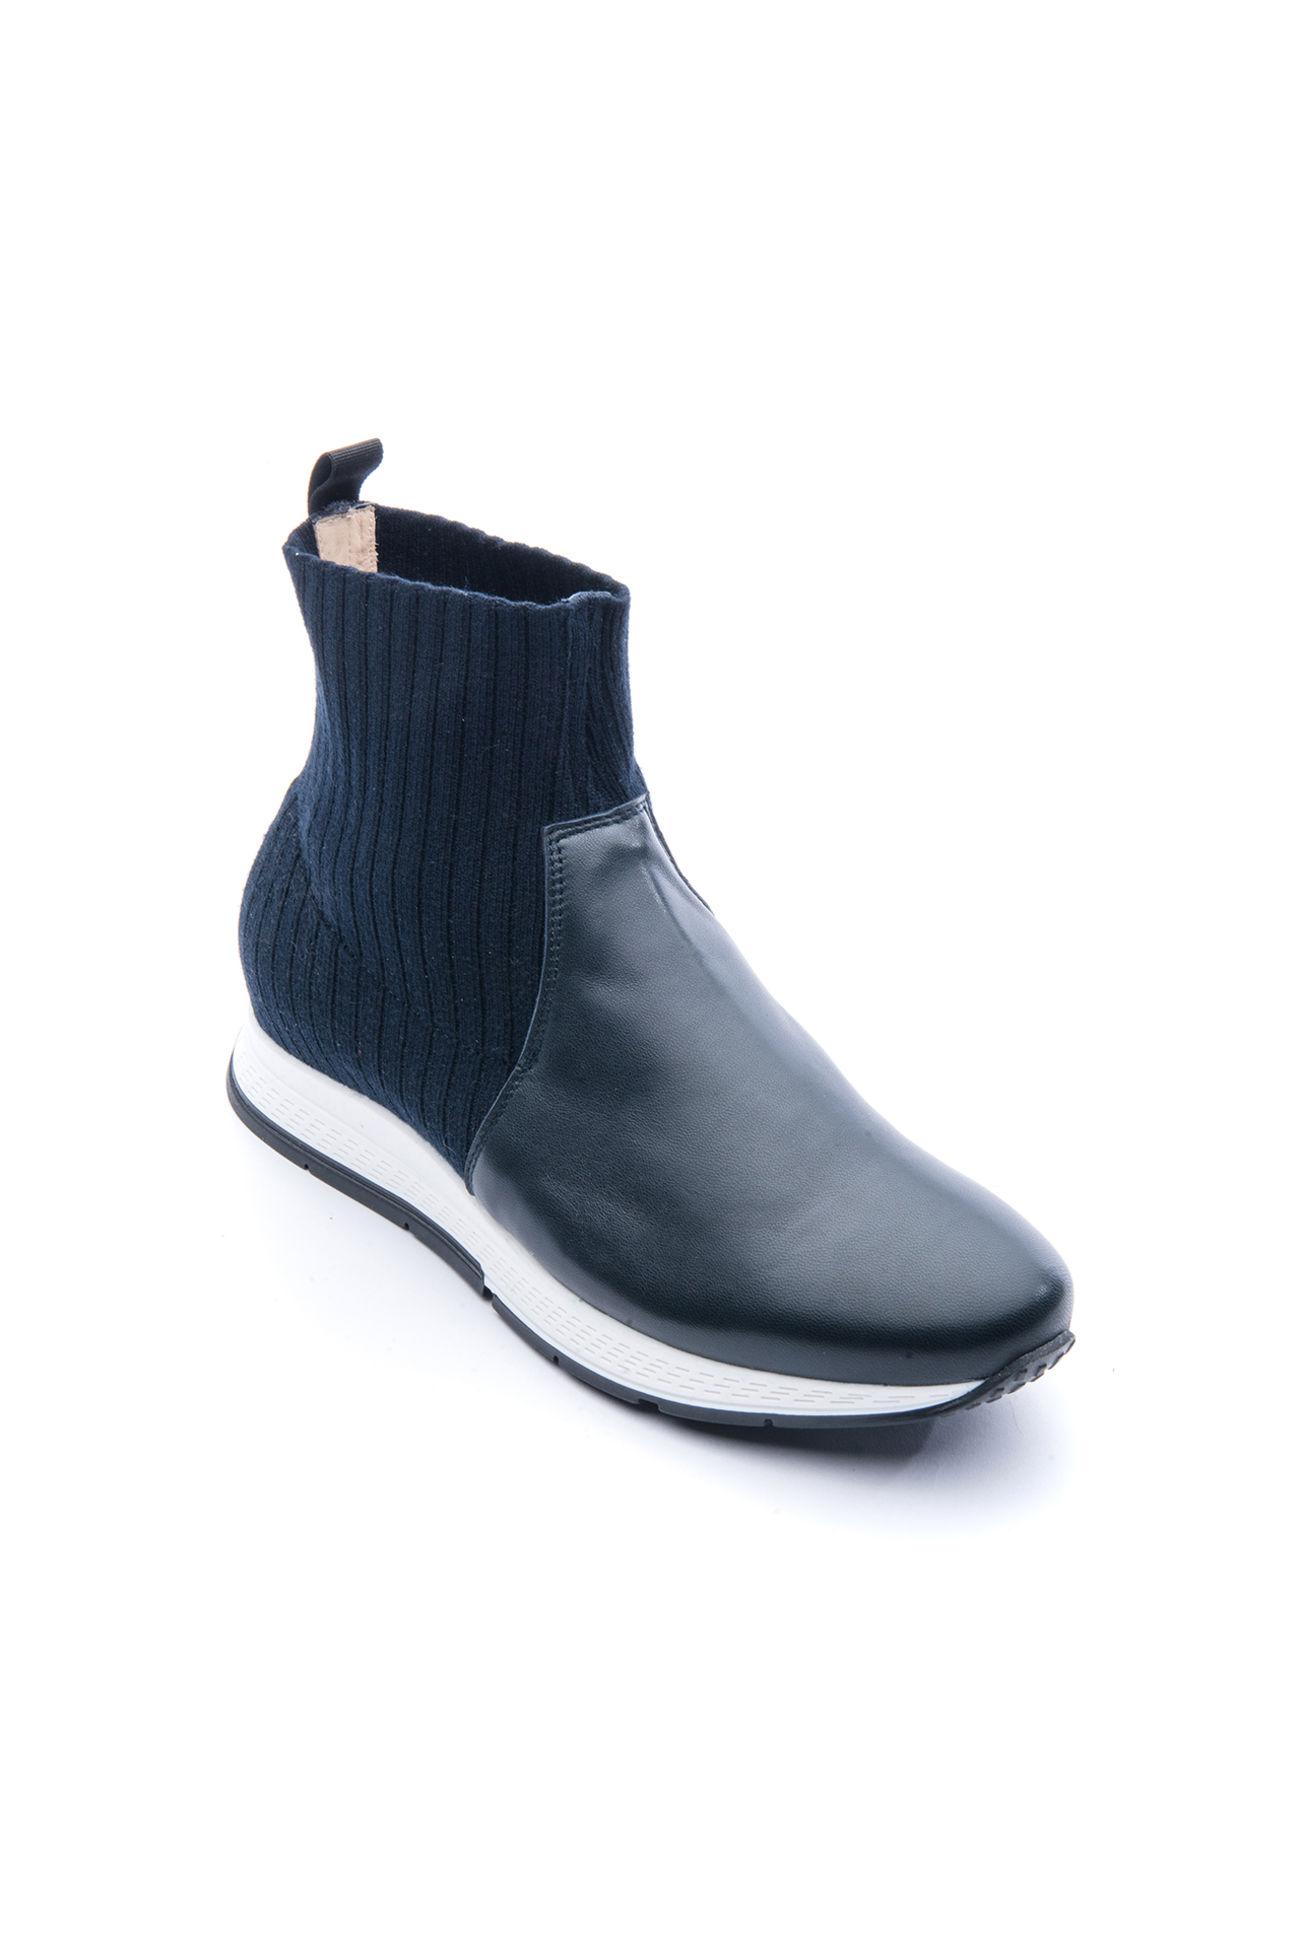 Nappa leather sockboot